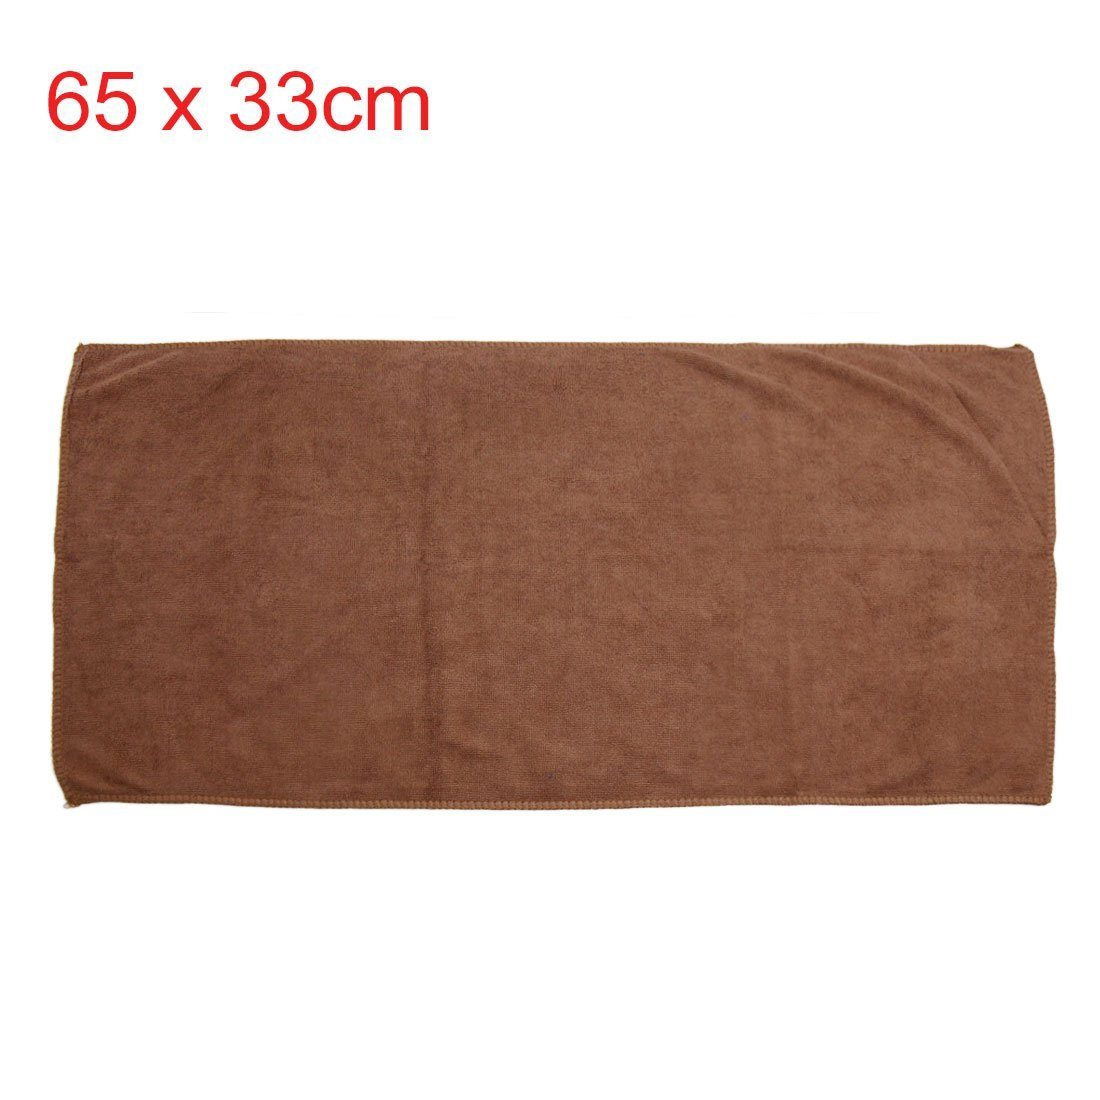 Amazon.com: eDealMax 3pcs 65 x 33cm paños de toalla de microfibra 250GSM Para el Lavado de coches Púrpura Amarillo Gris: Automotive